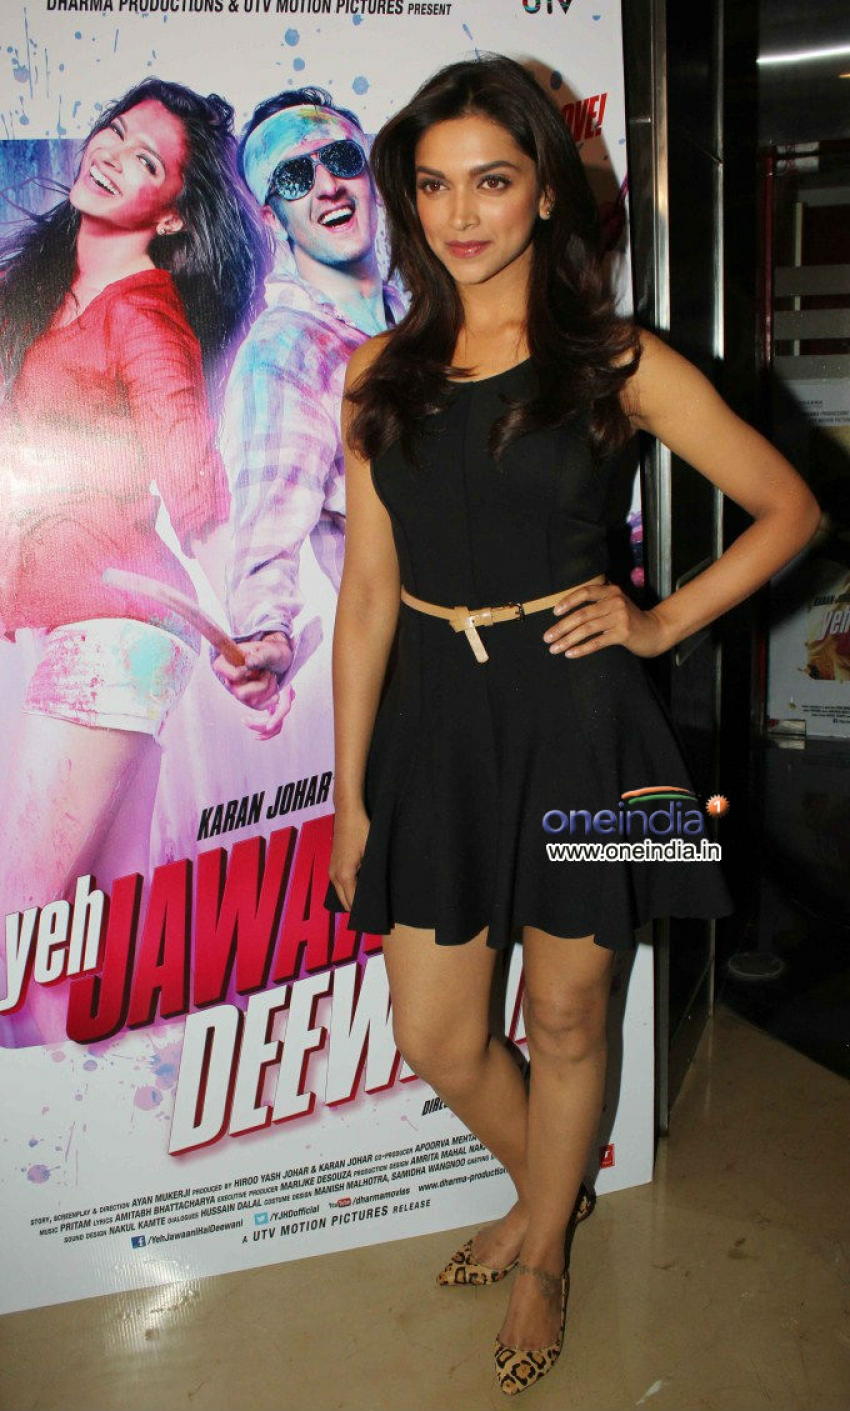 First Look Launch of Yeh Jawaani Hai Deewani Photos